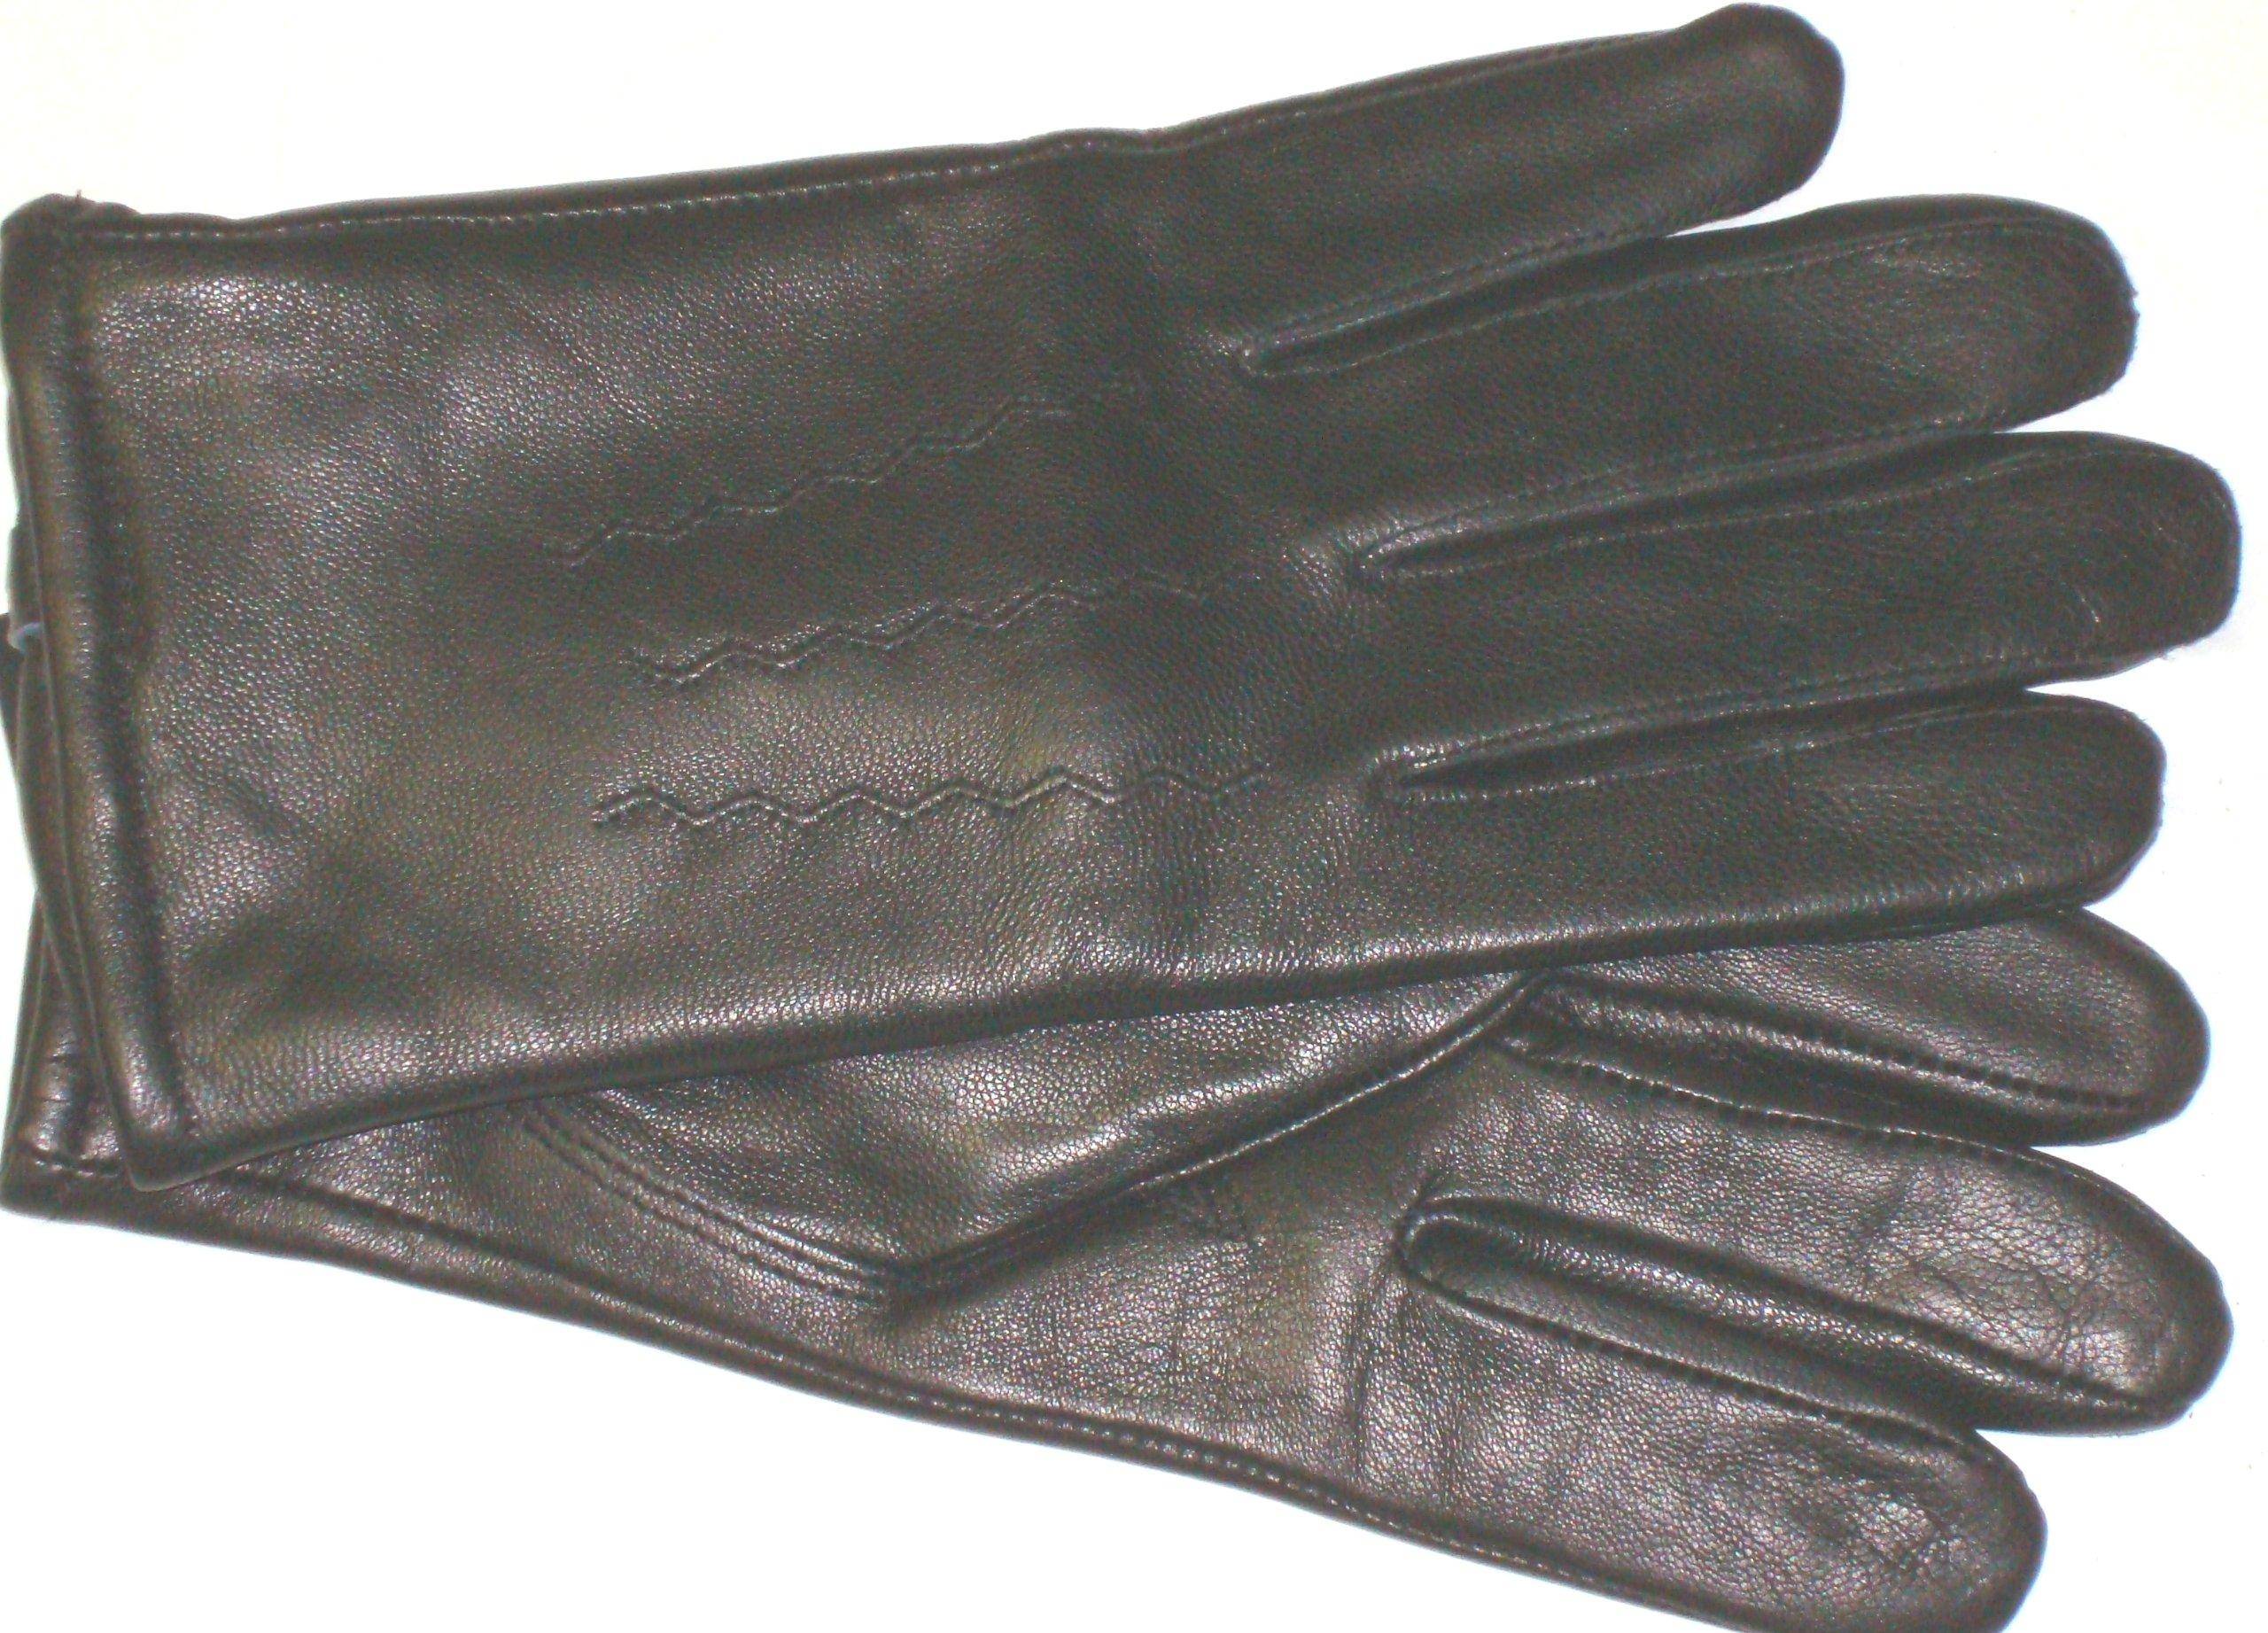 Imported Genuine Black Leather Microfiber Lined Men's Gloves Size Medium